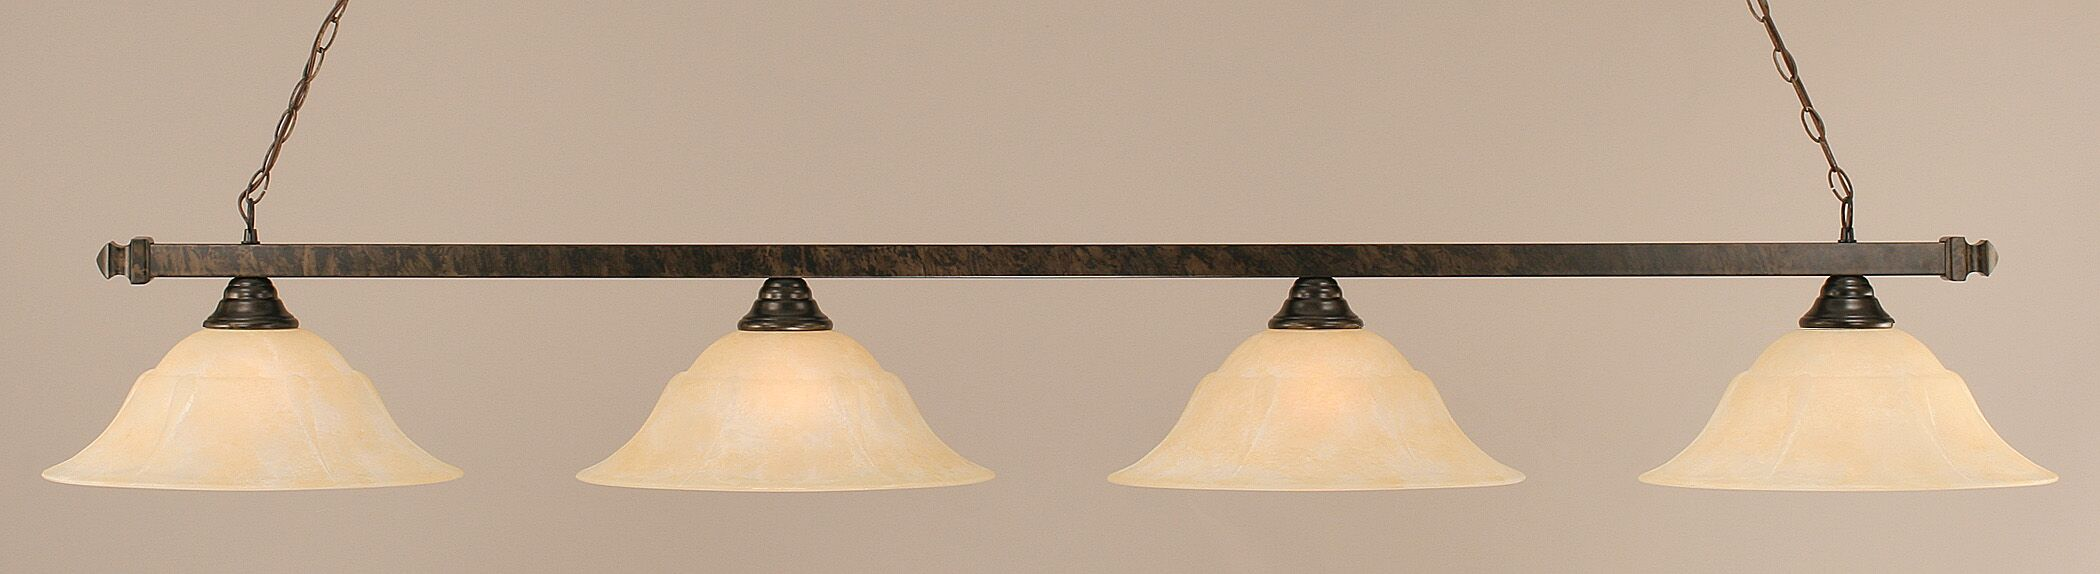 Strong 4-Light Pool Table Light